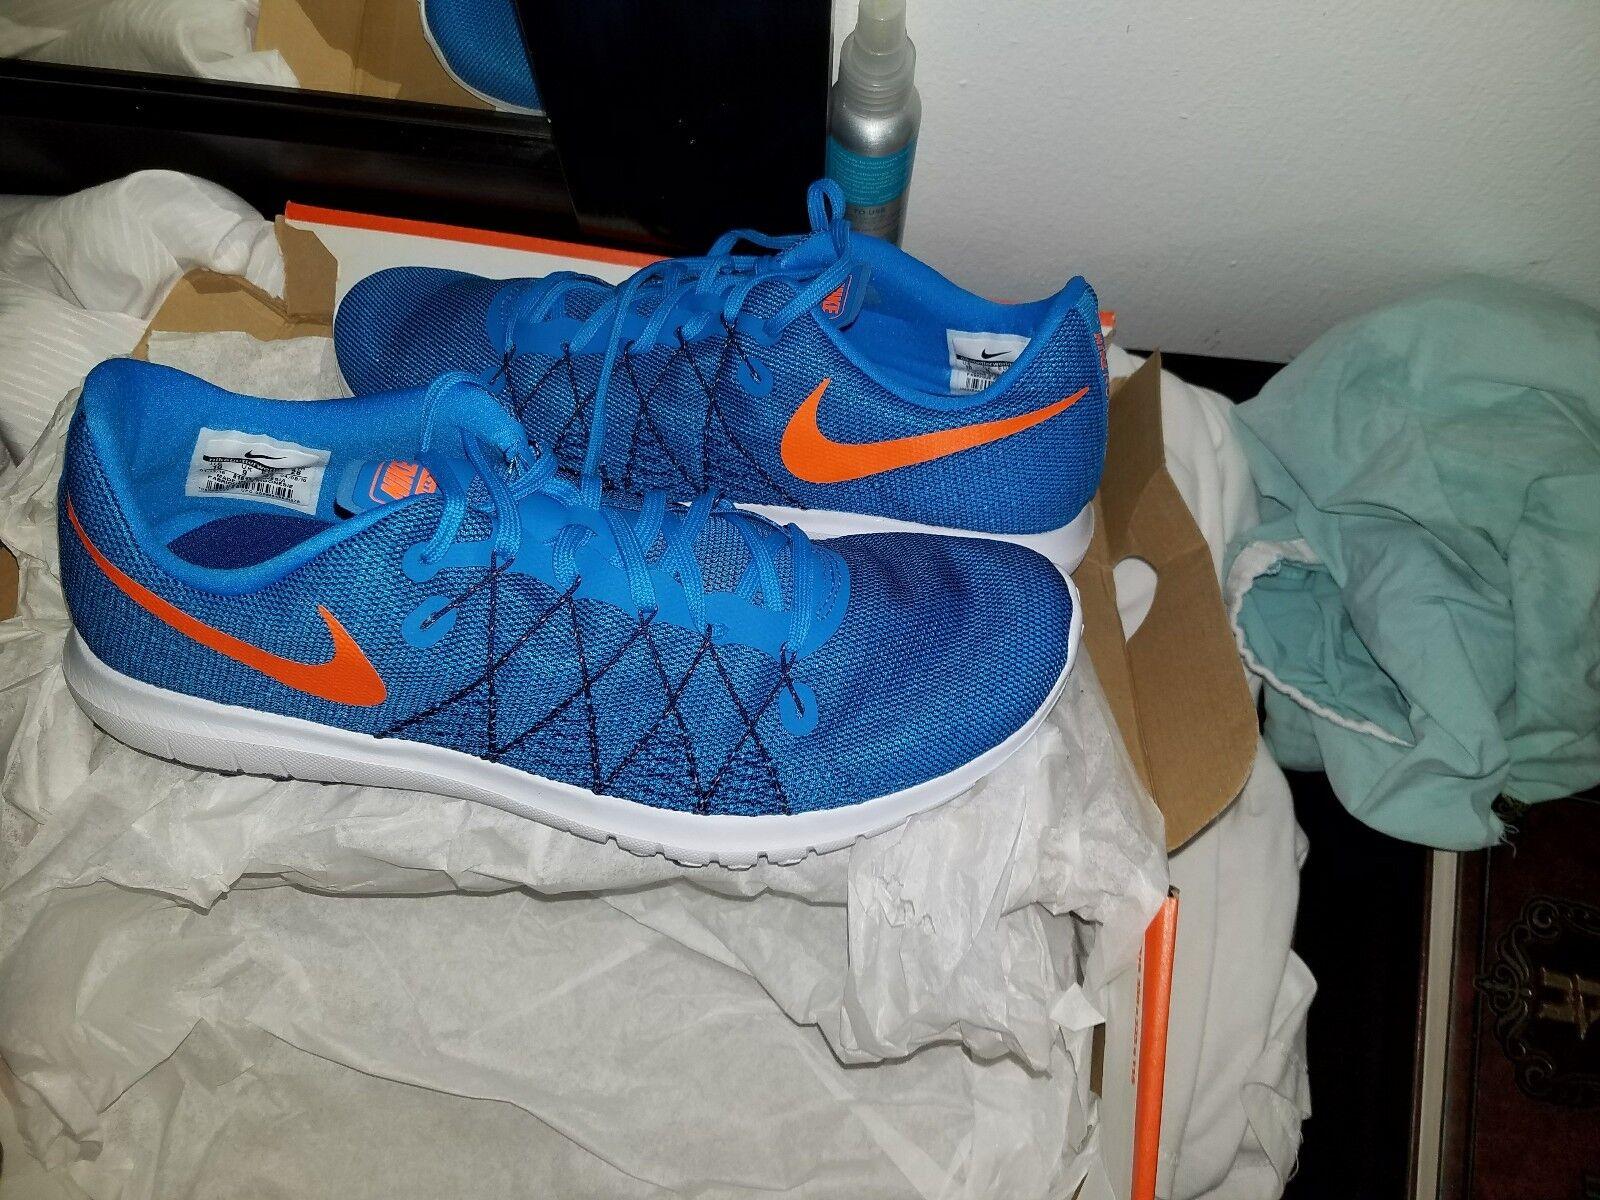 Nike Flex Fury Blue 2 Mens 819134-404 Racer Blue Fury Glow Mesh Running Shoes Size 10 7a239e